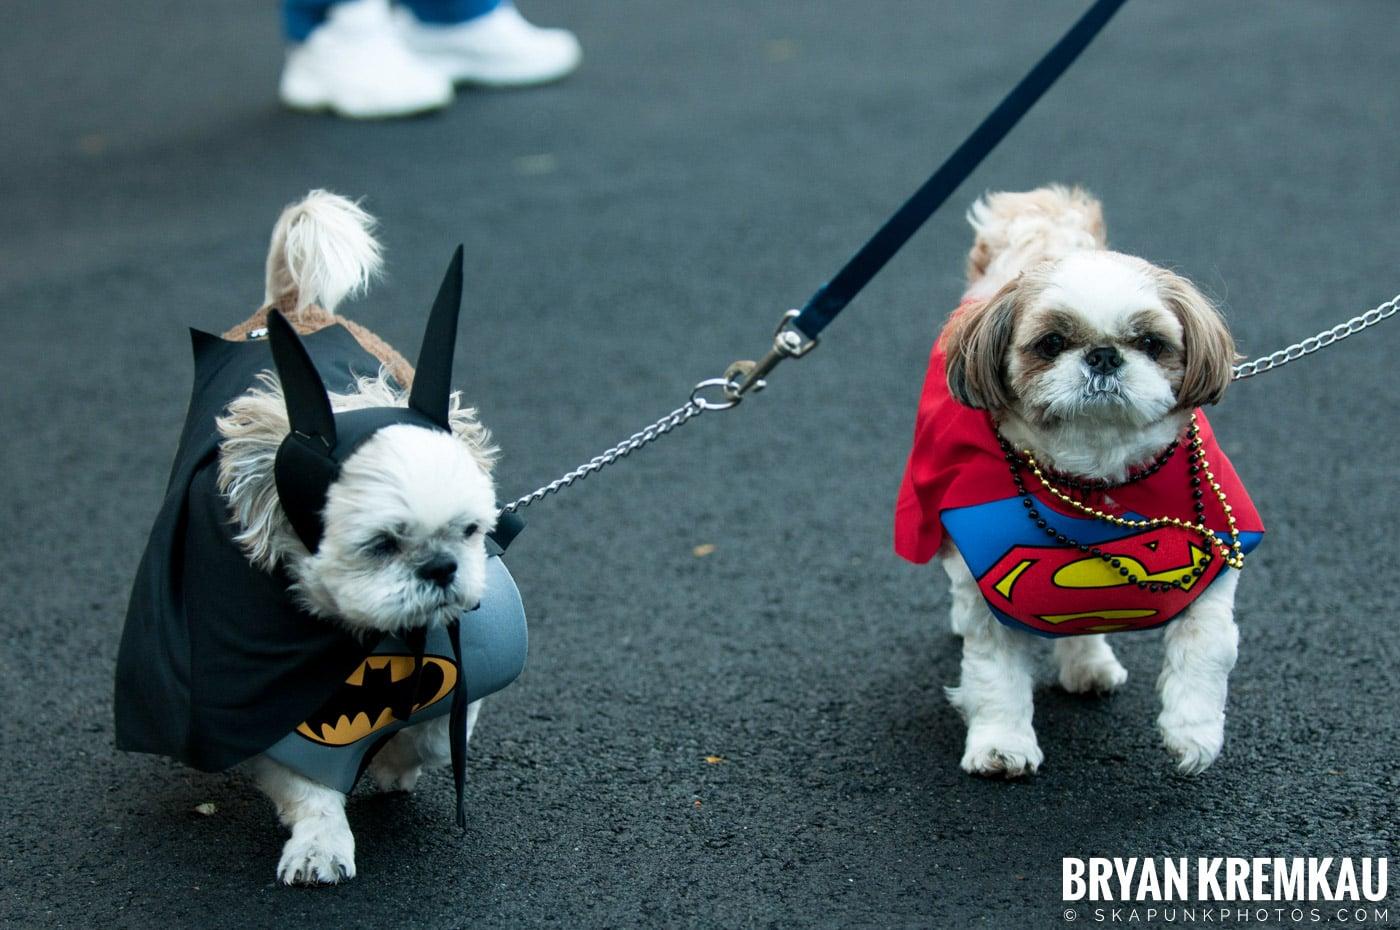 Paulus Hook Halloween Pet Parade 2011 @ Jersey City, NJ - 10.30.11 (40)